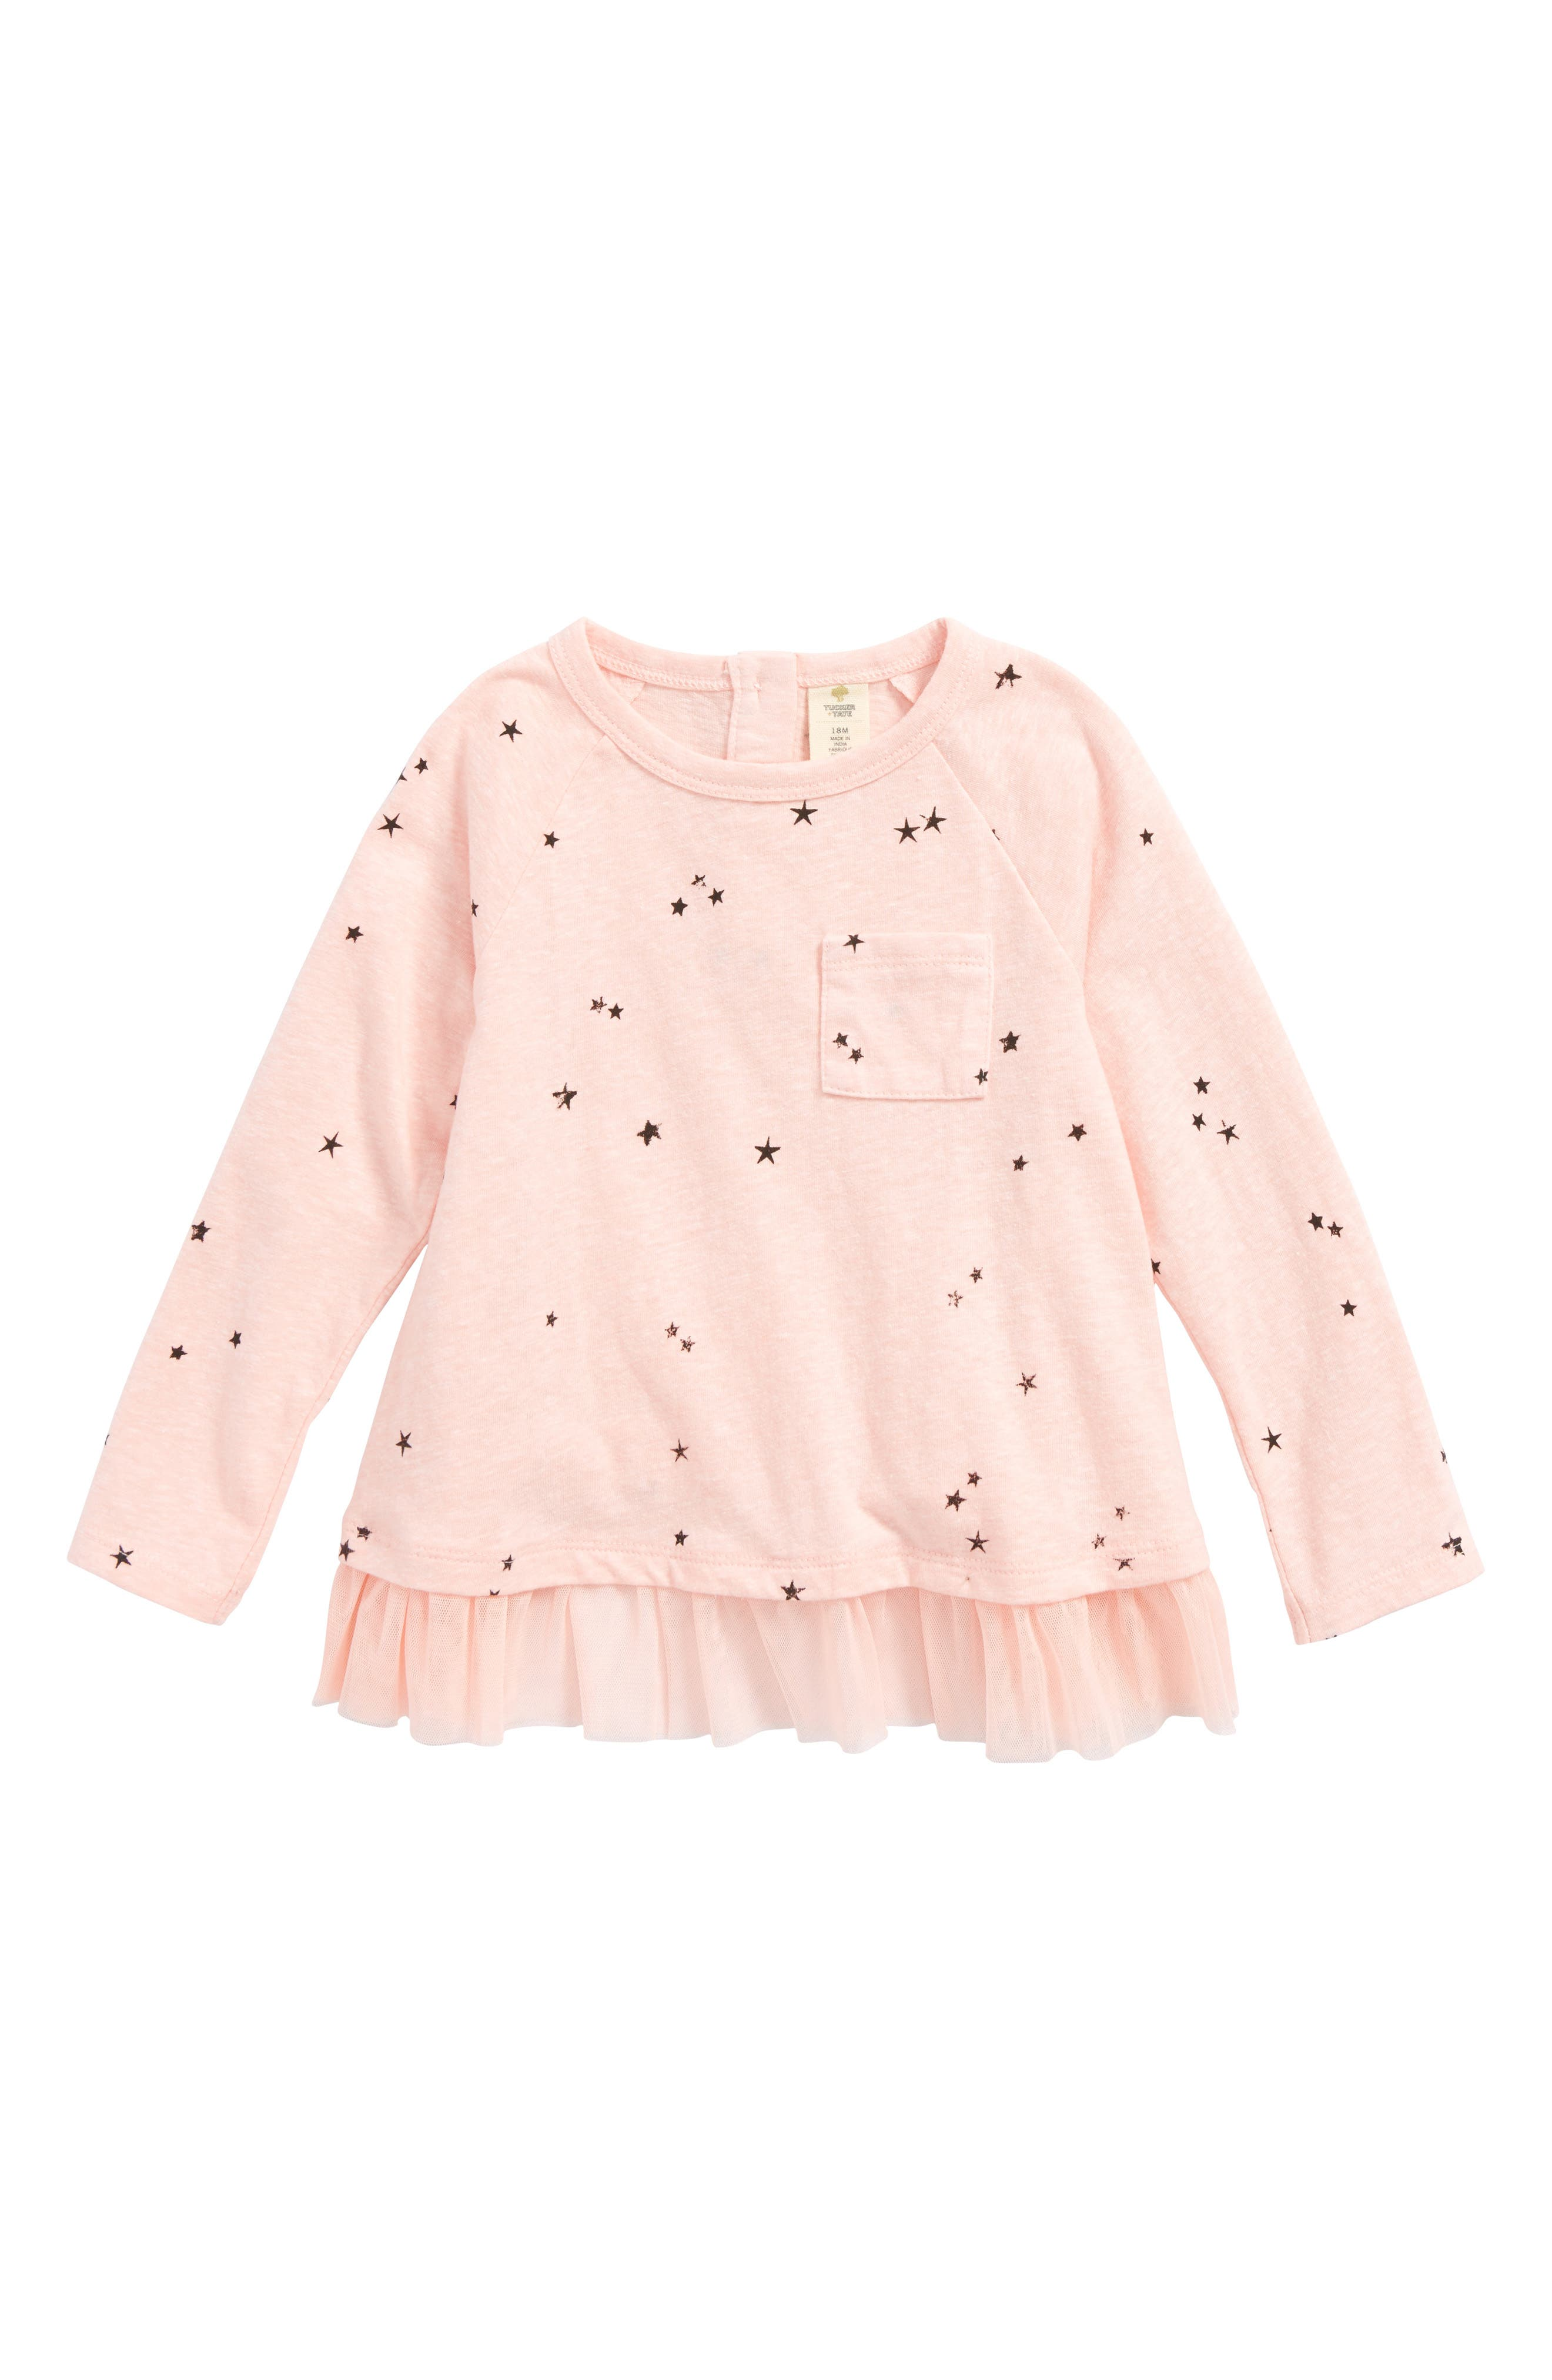 Mesh Hem Tee,                         Main,                         color, Pink Cloud Scattered Stars